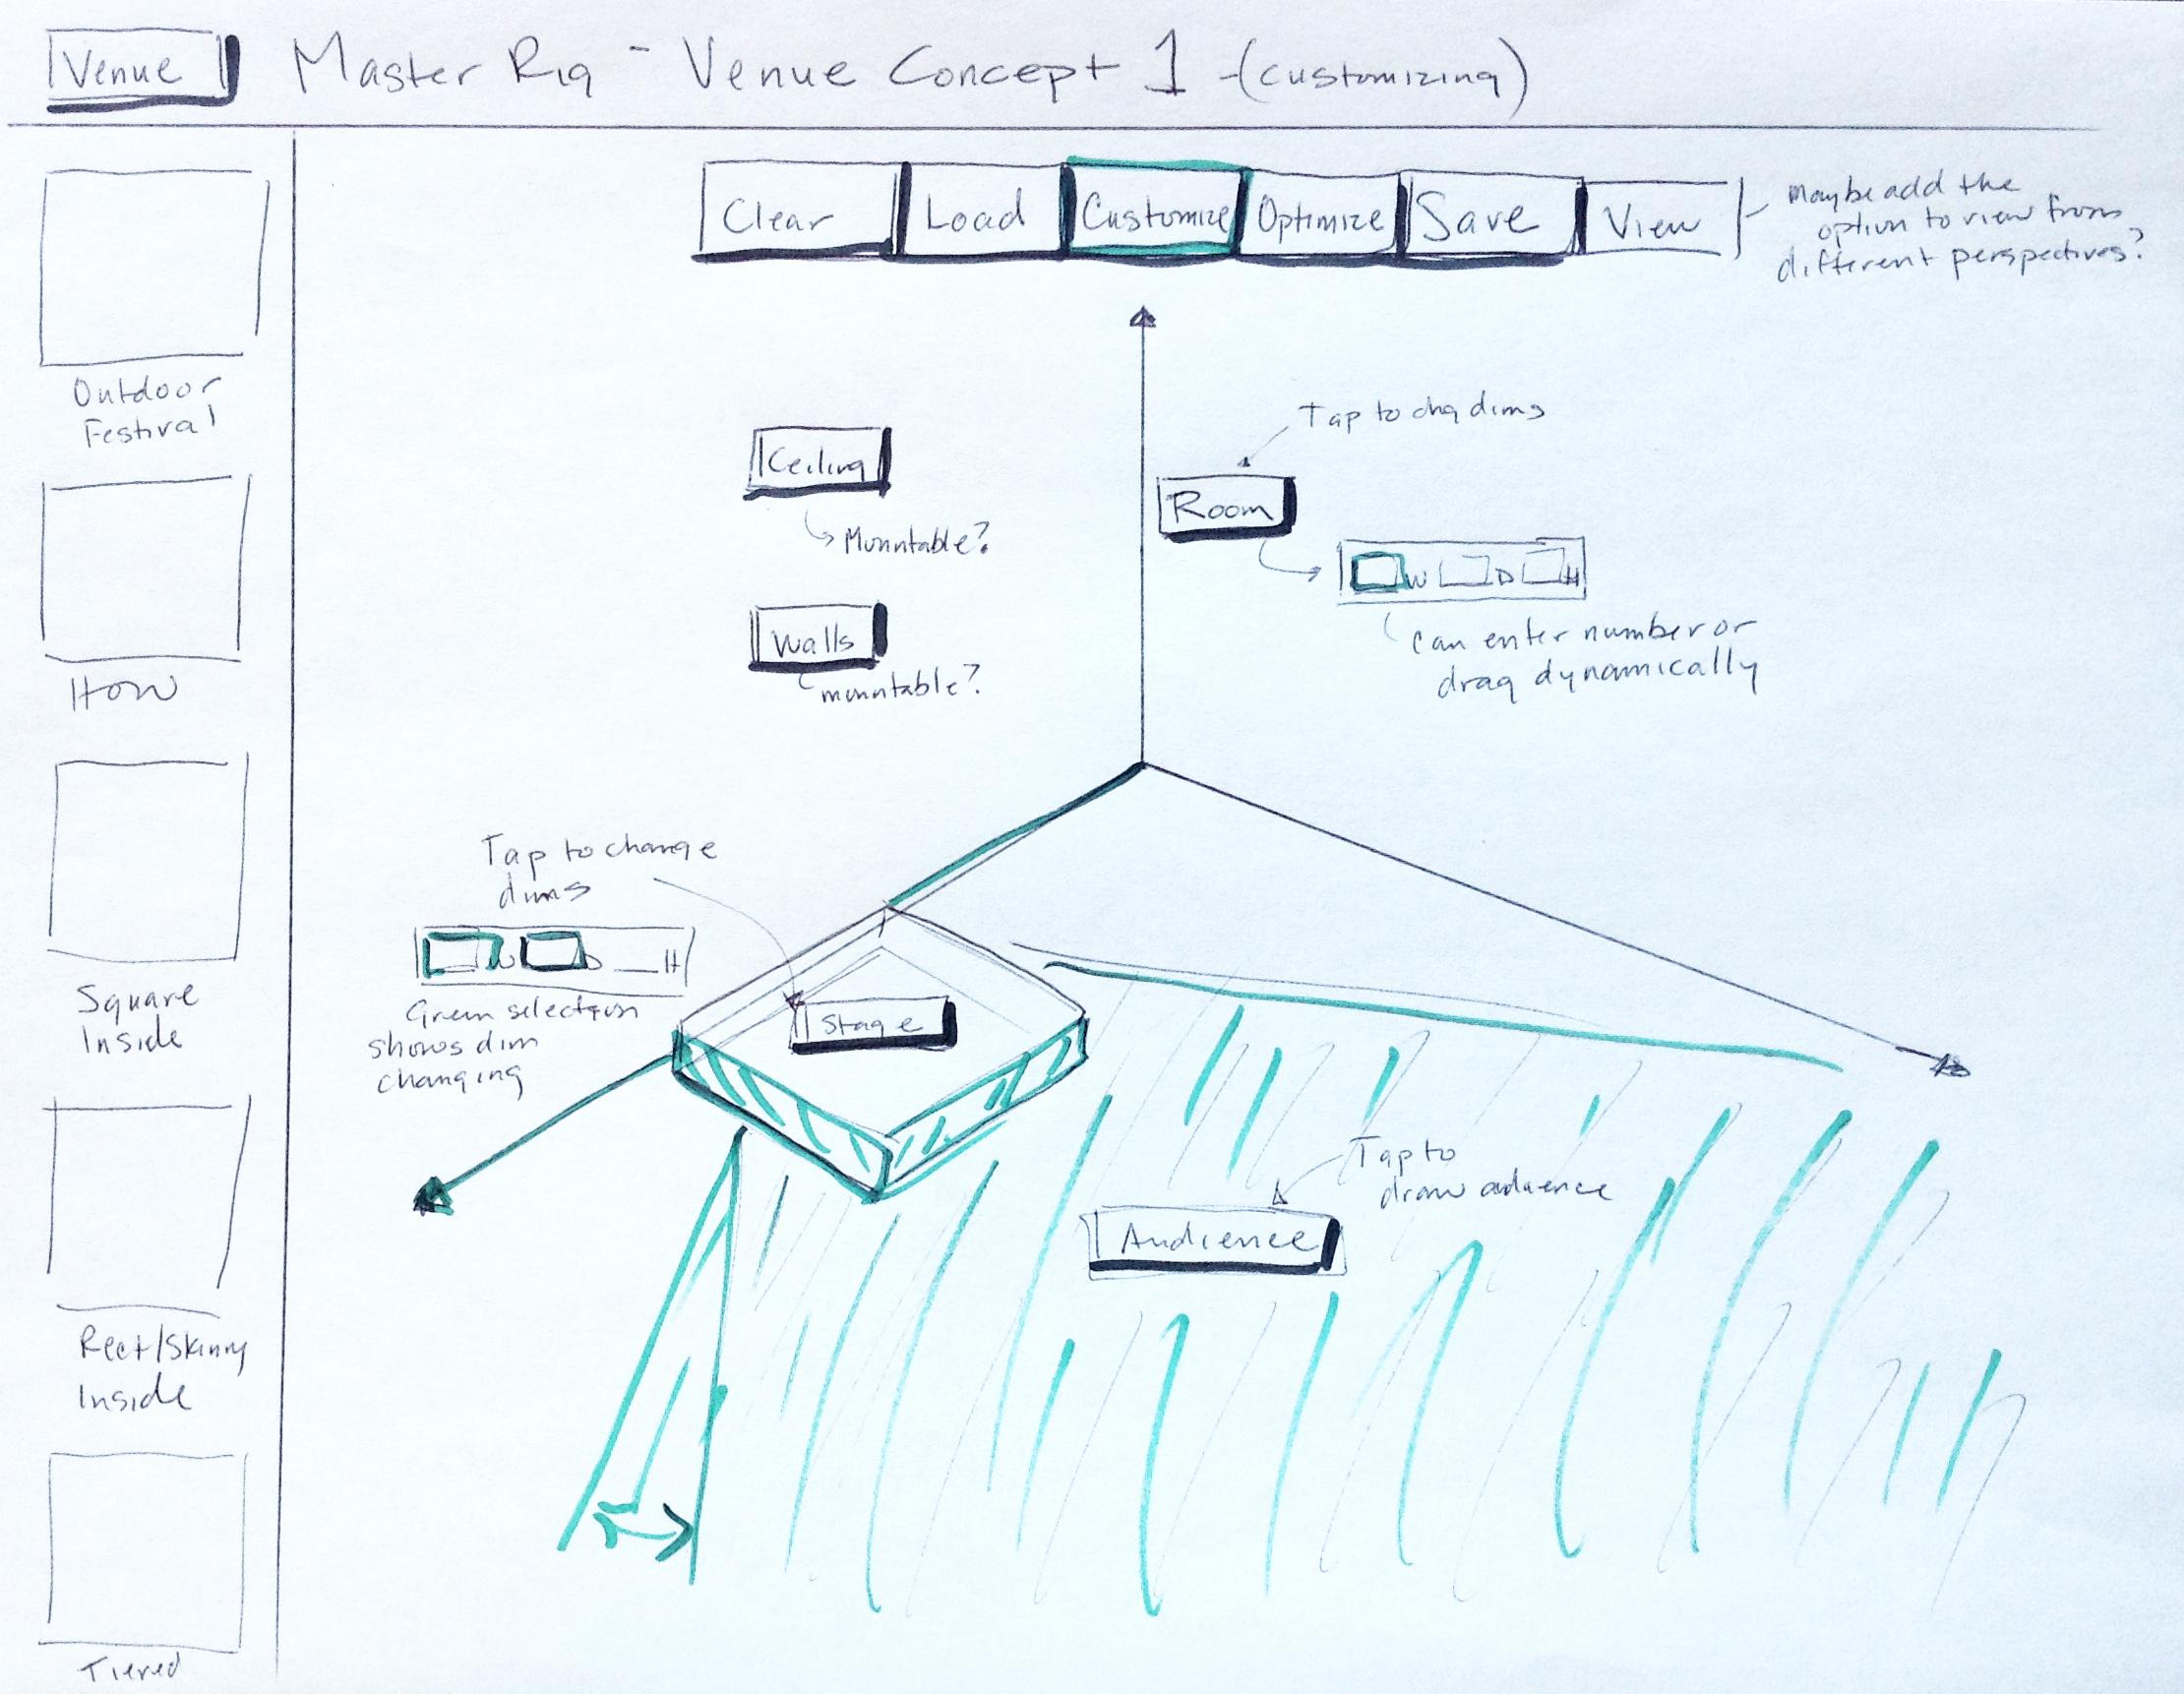 MR Concept sketch - Venue customizing.jpg